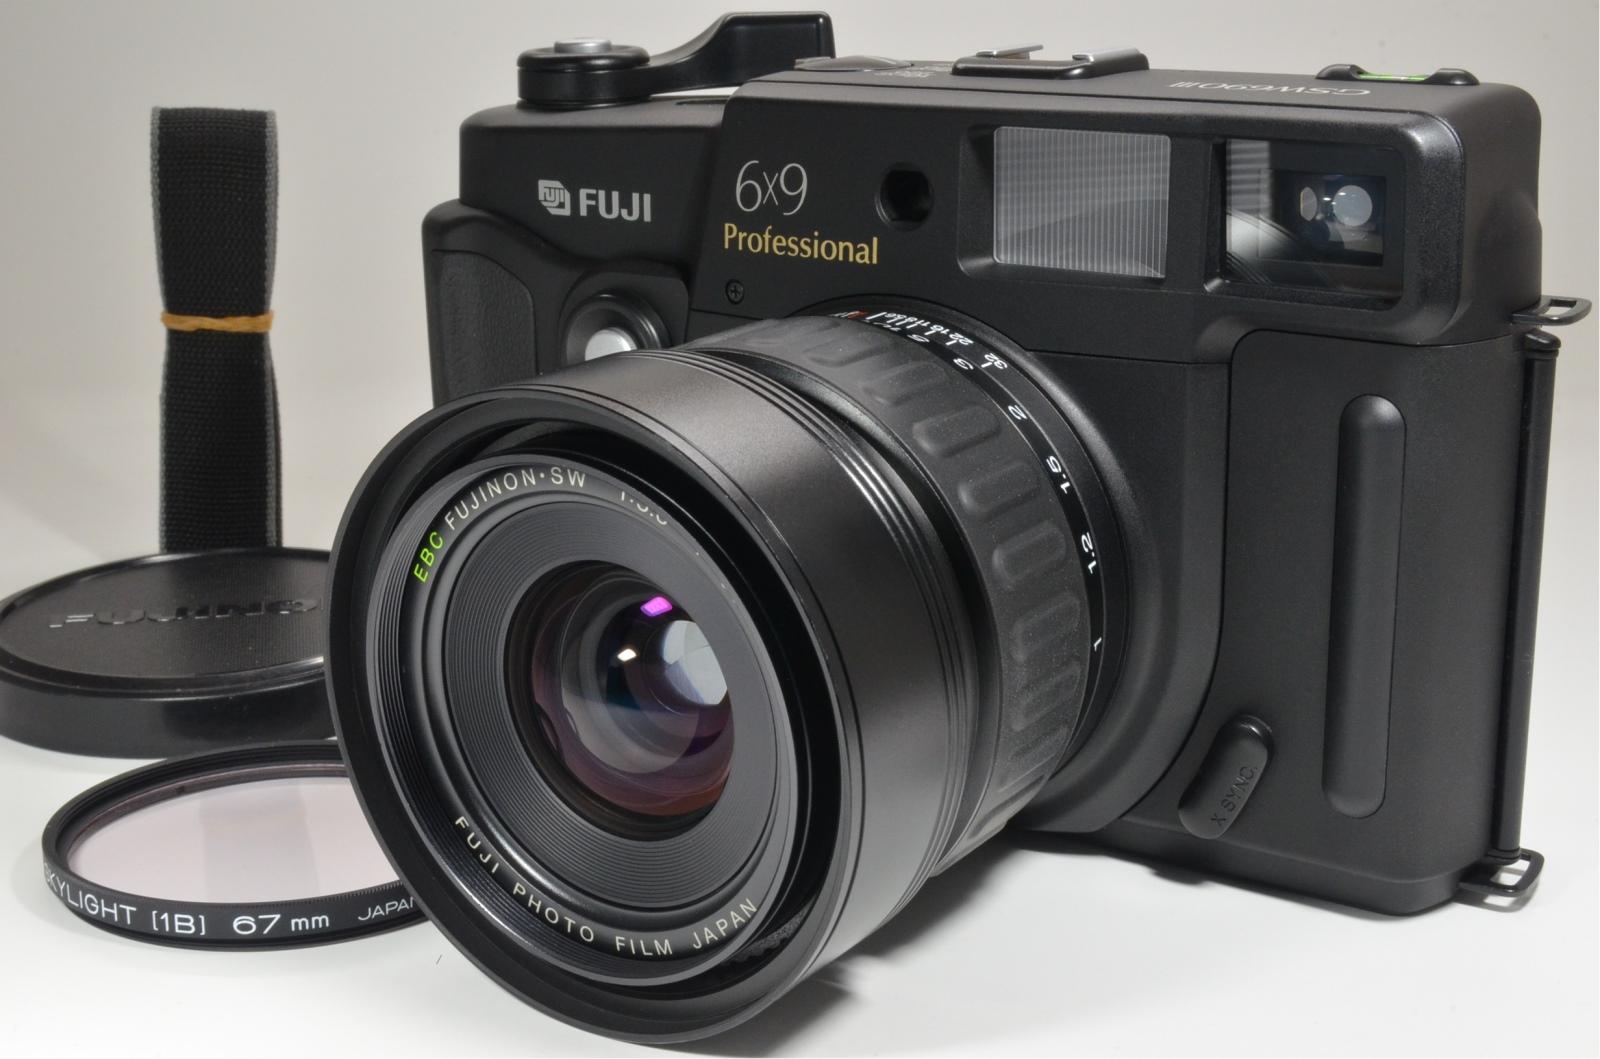 fuji fujifilm gsw690iii professional ebc 65mm f5.6 count '051' rare!